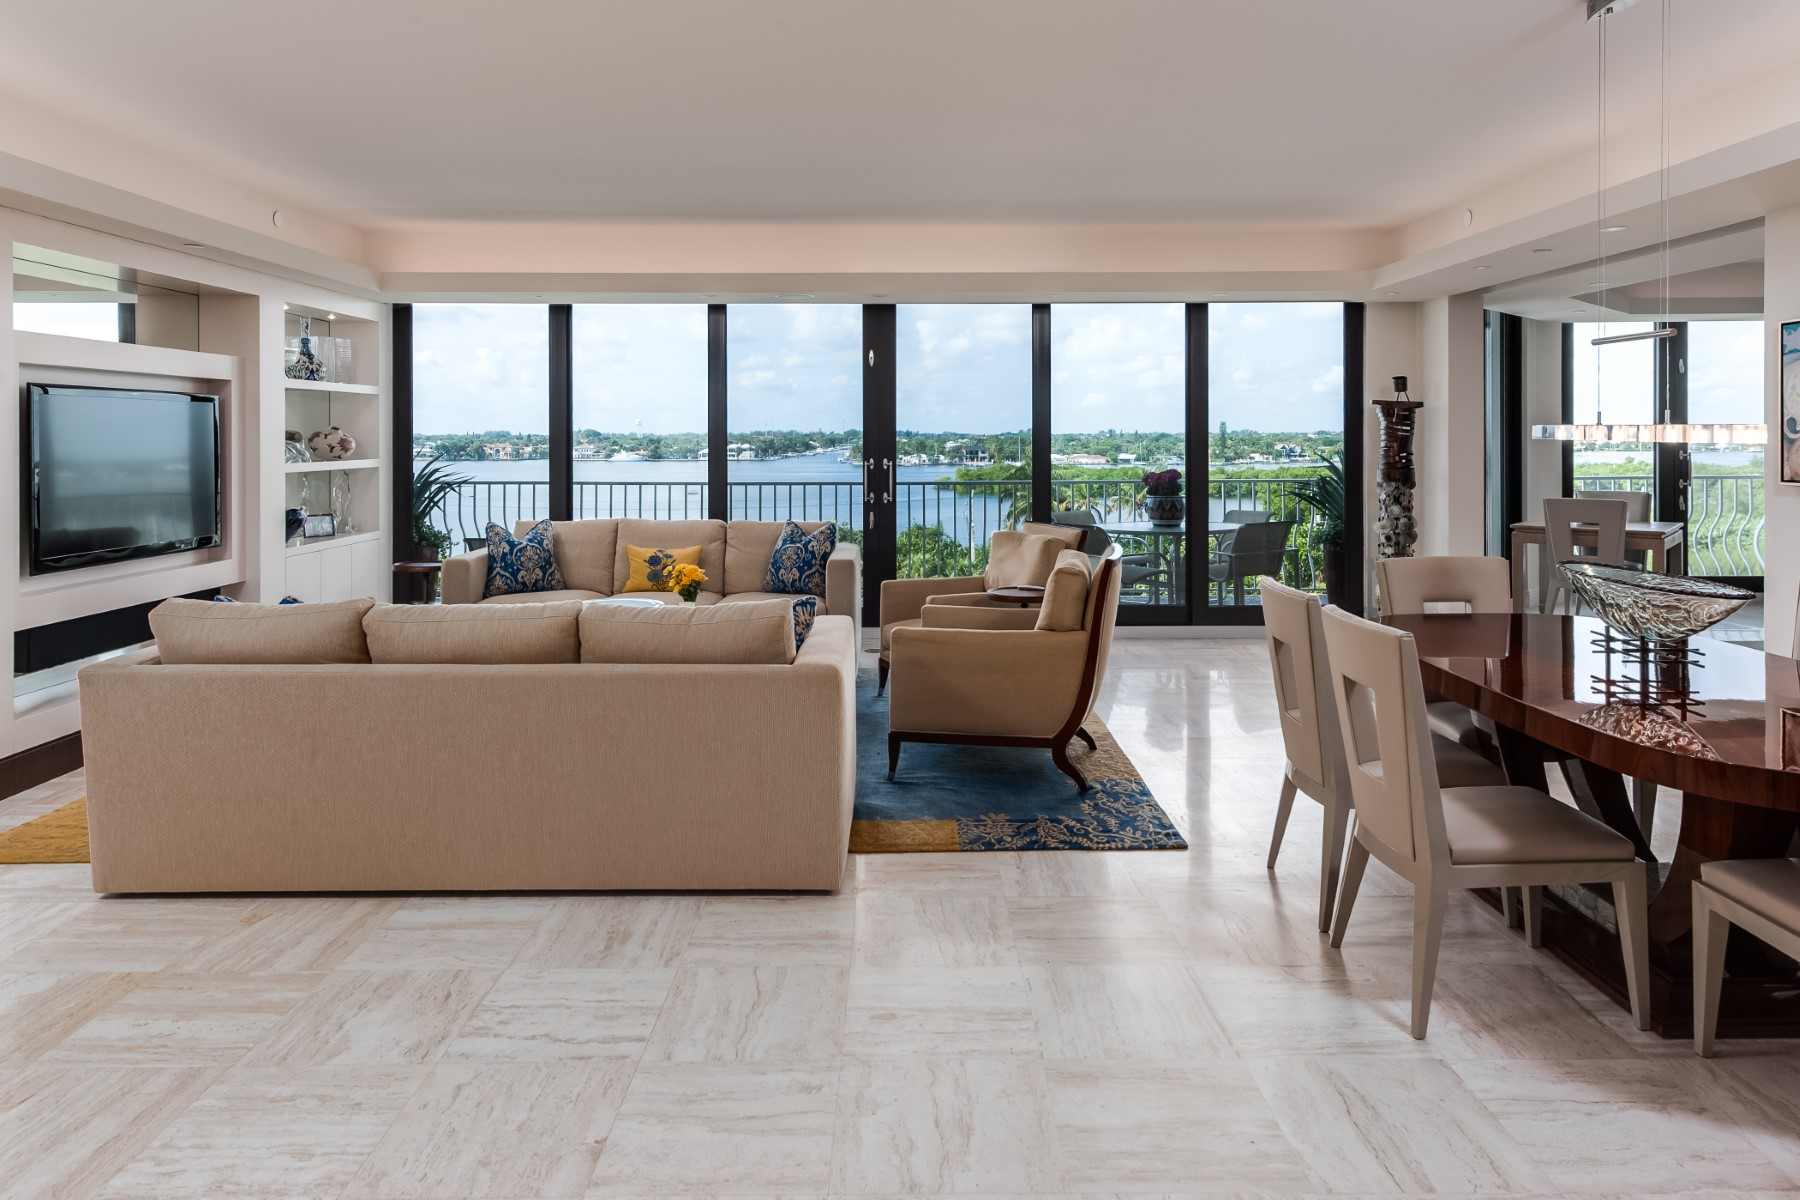 Condominium for Sale at Spectacular Sunsets 2000 S Ocean Blvd Apt 405n Palm Beach, Florida 33480 United States